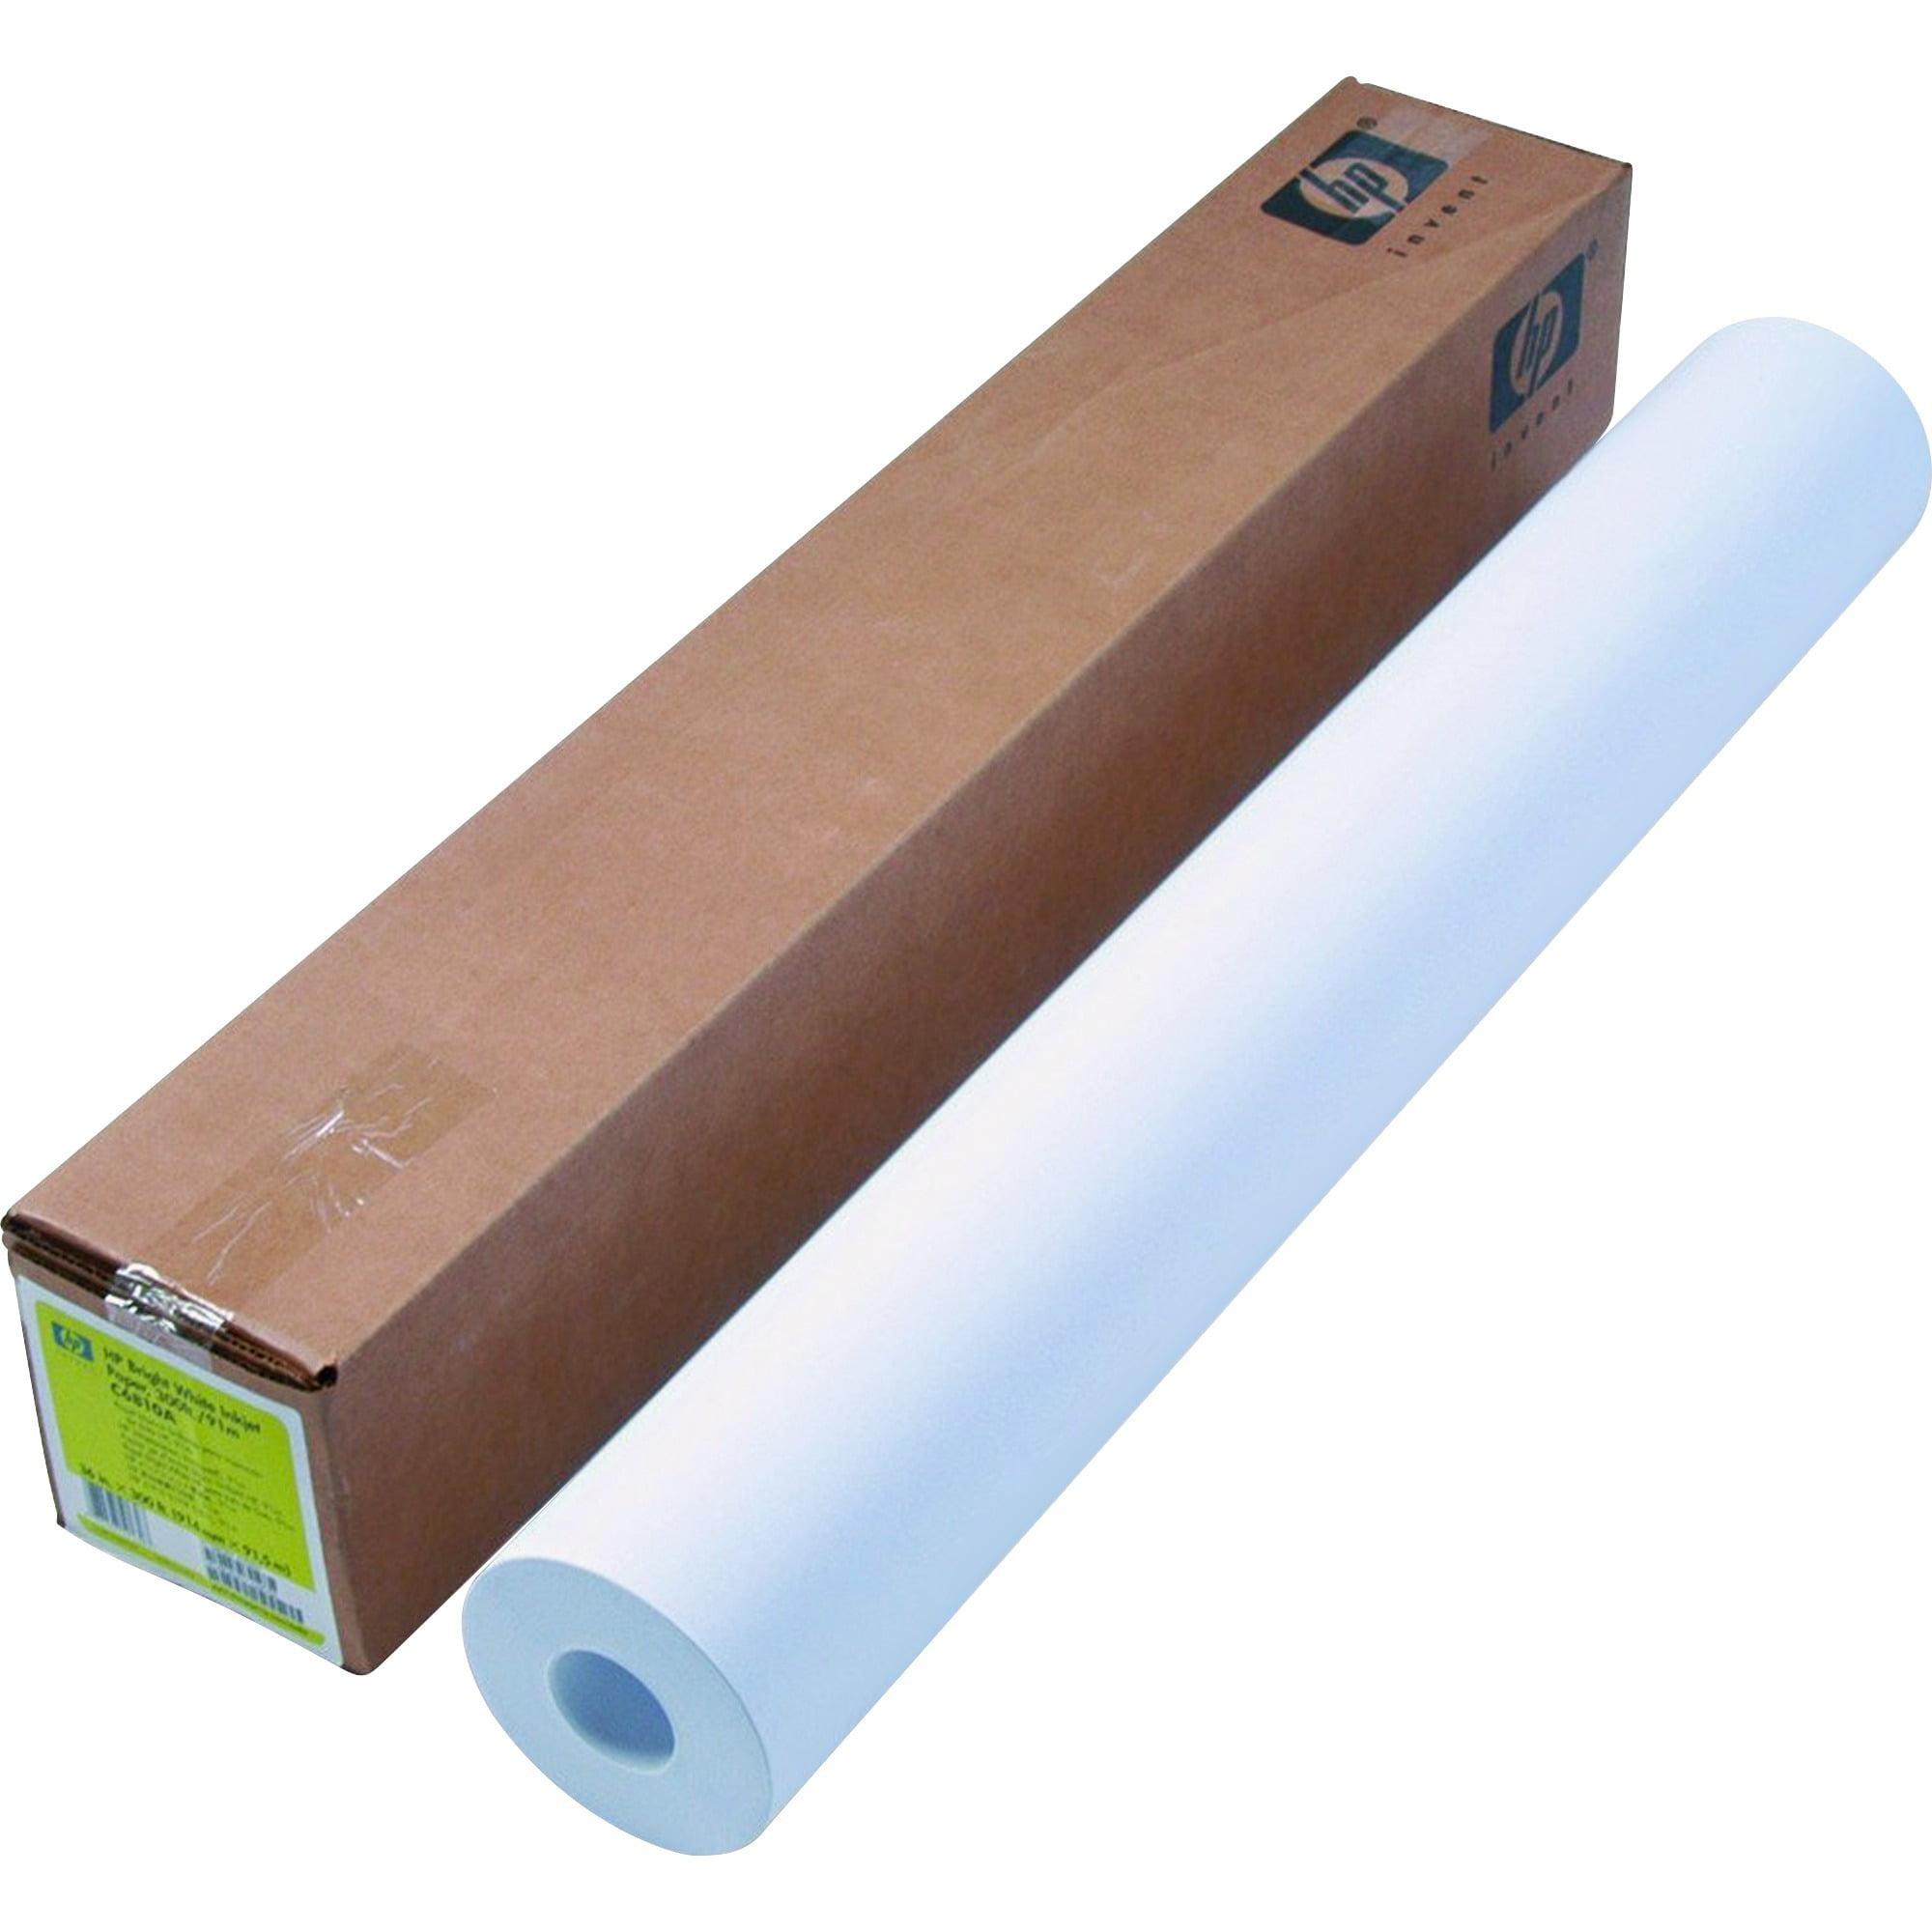 HP, HEWC6810A, Bright White Inkjet Bond Paper, 1 Roll, White